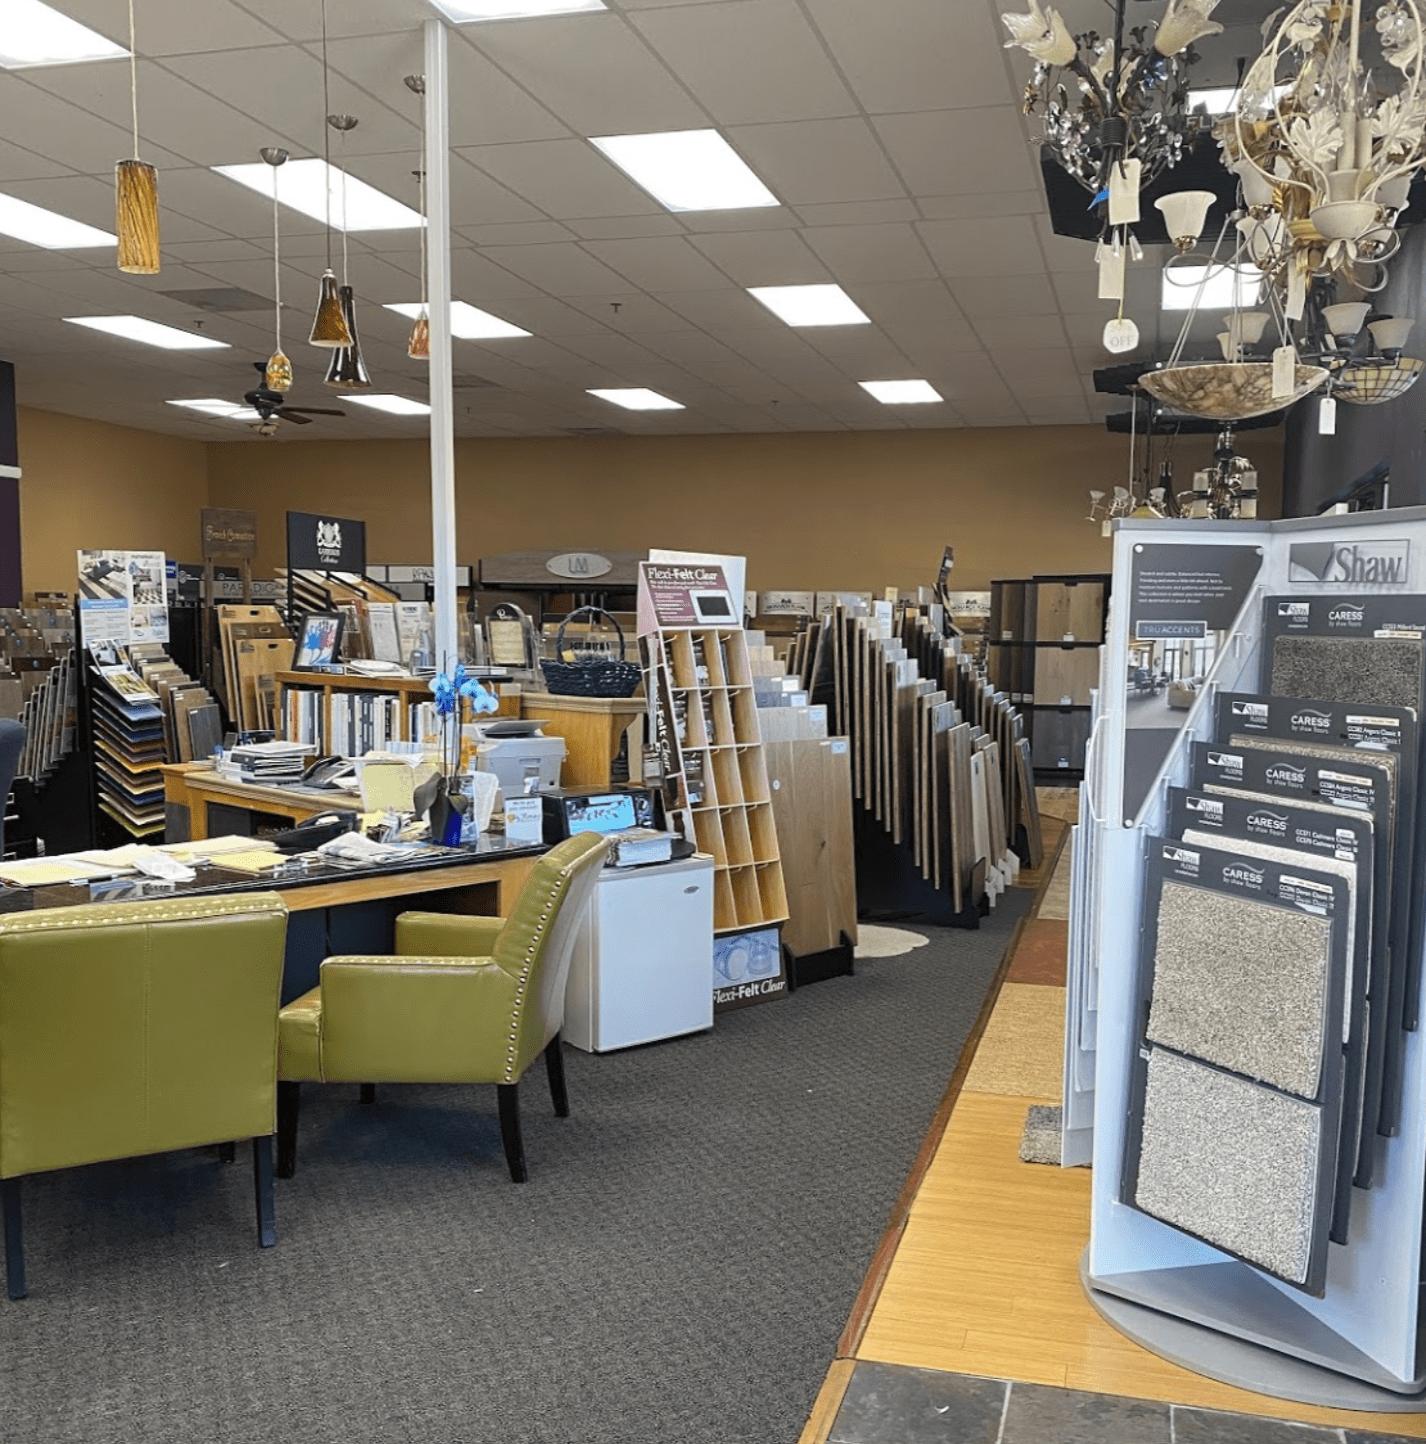 Carpet Center showroom near Rohnert Park, CA